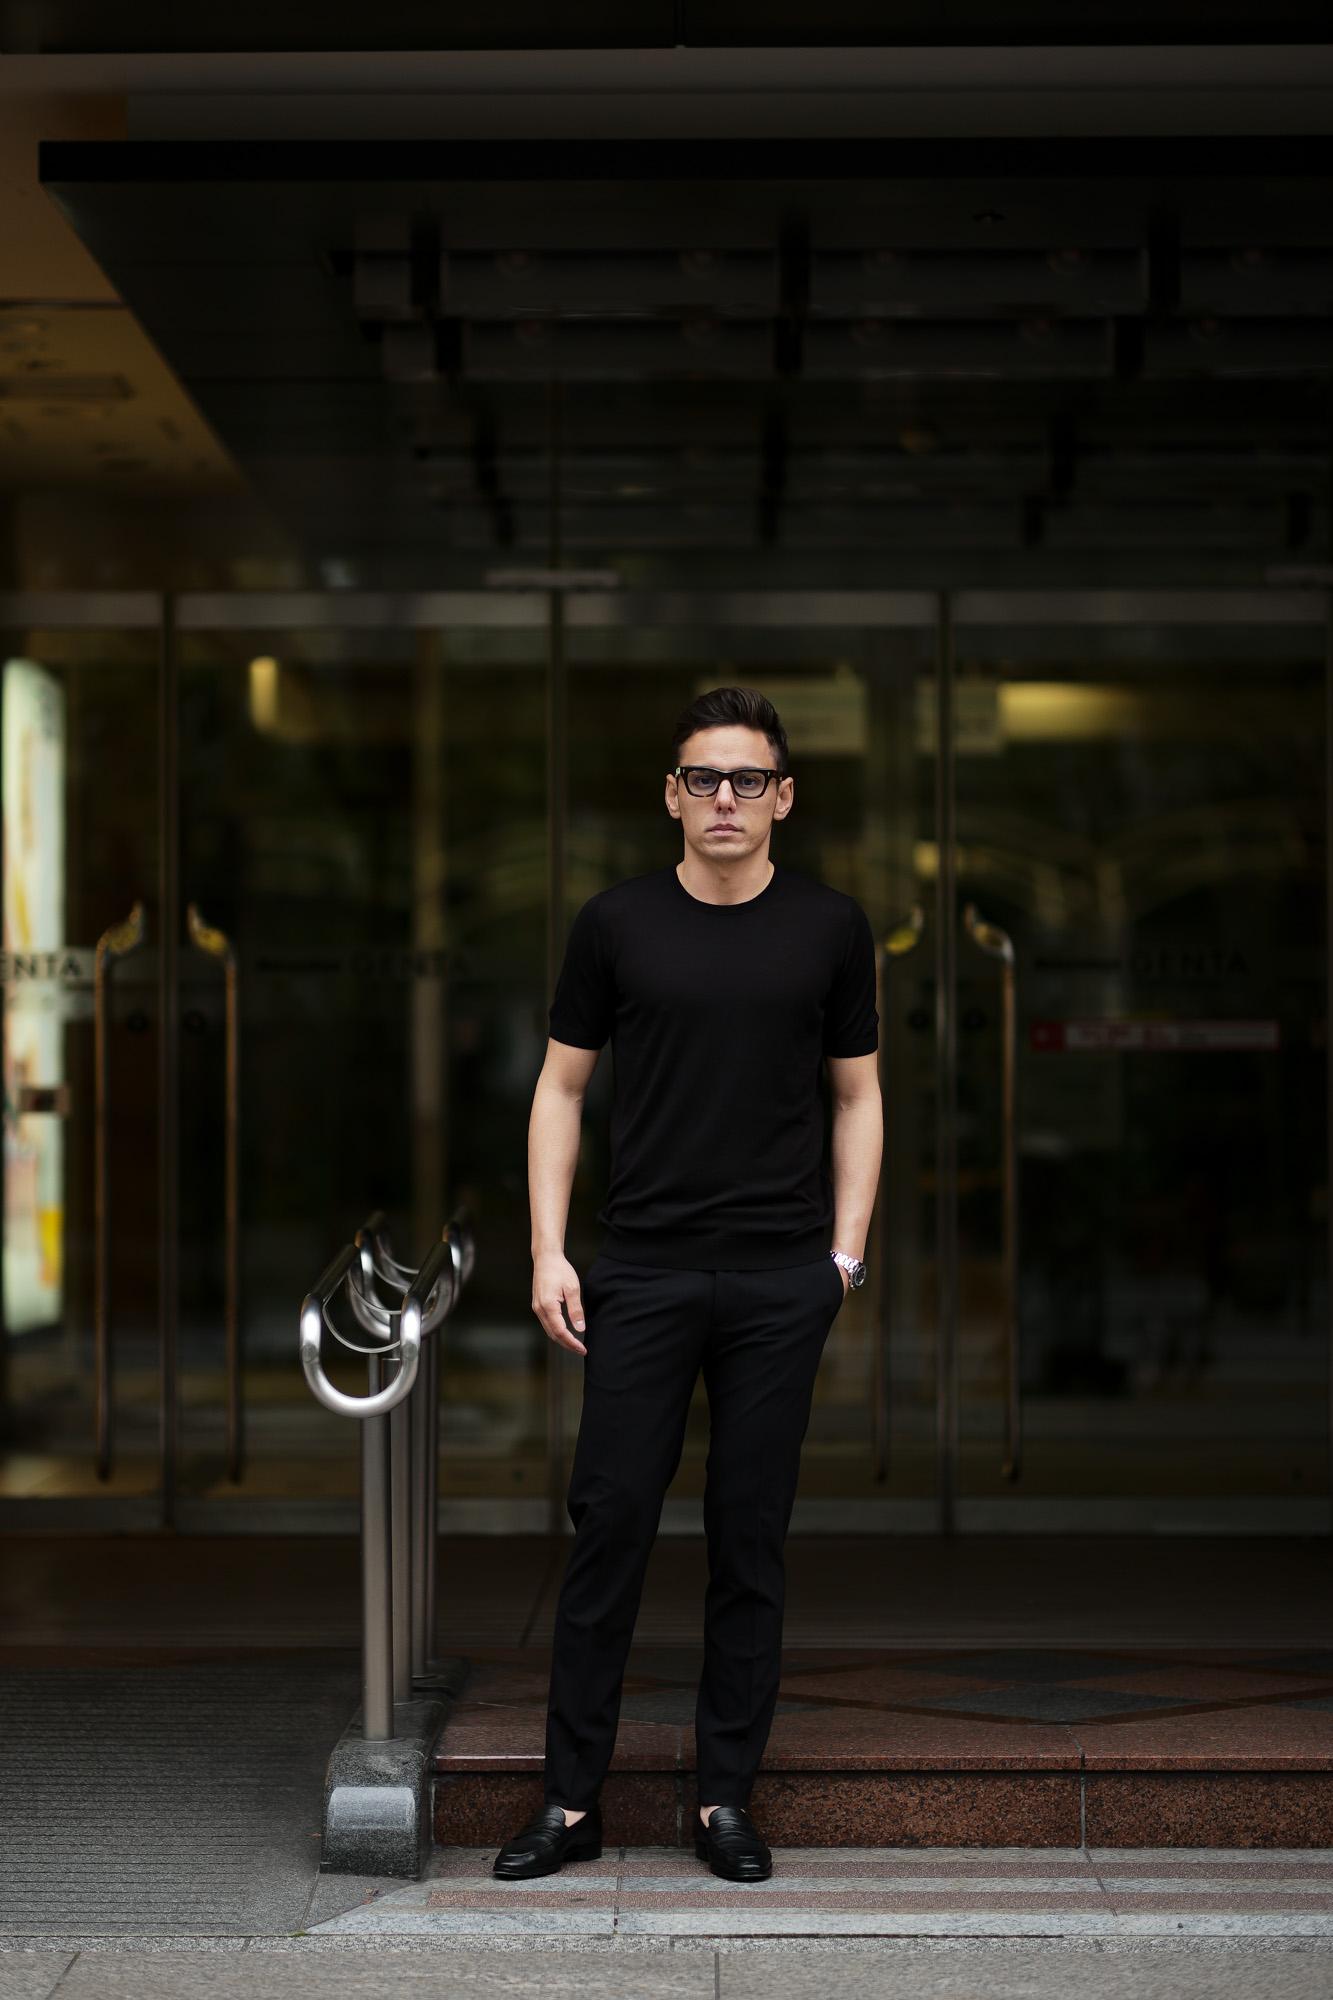 Gran Sasso (グランサッソ) Silk Knit T-shirt (シルクニット Tシャツ) SETA (シルク 100%) ショートスリーブ シルク ニット Tシャツ BLACK (ブラック・099) made in italy (イタリア製) 2020 春夏新作  gransasso 愛知 名古屋 altoediritto アルトエデリット